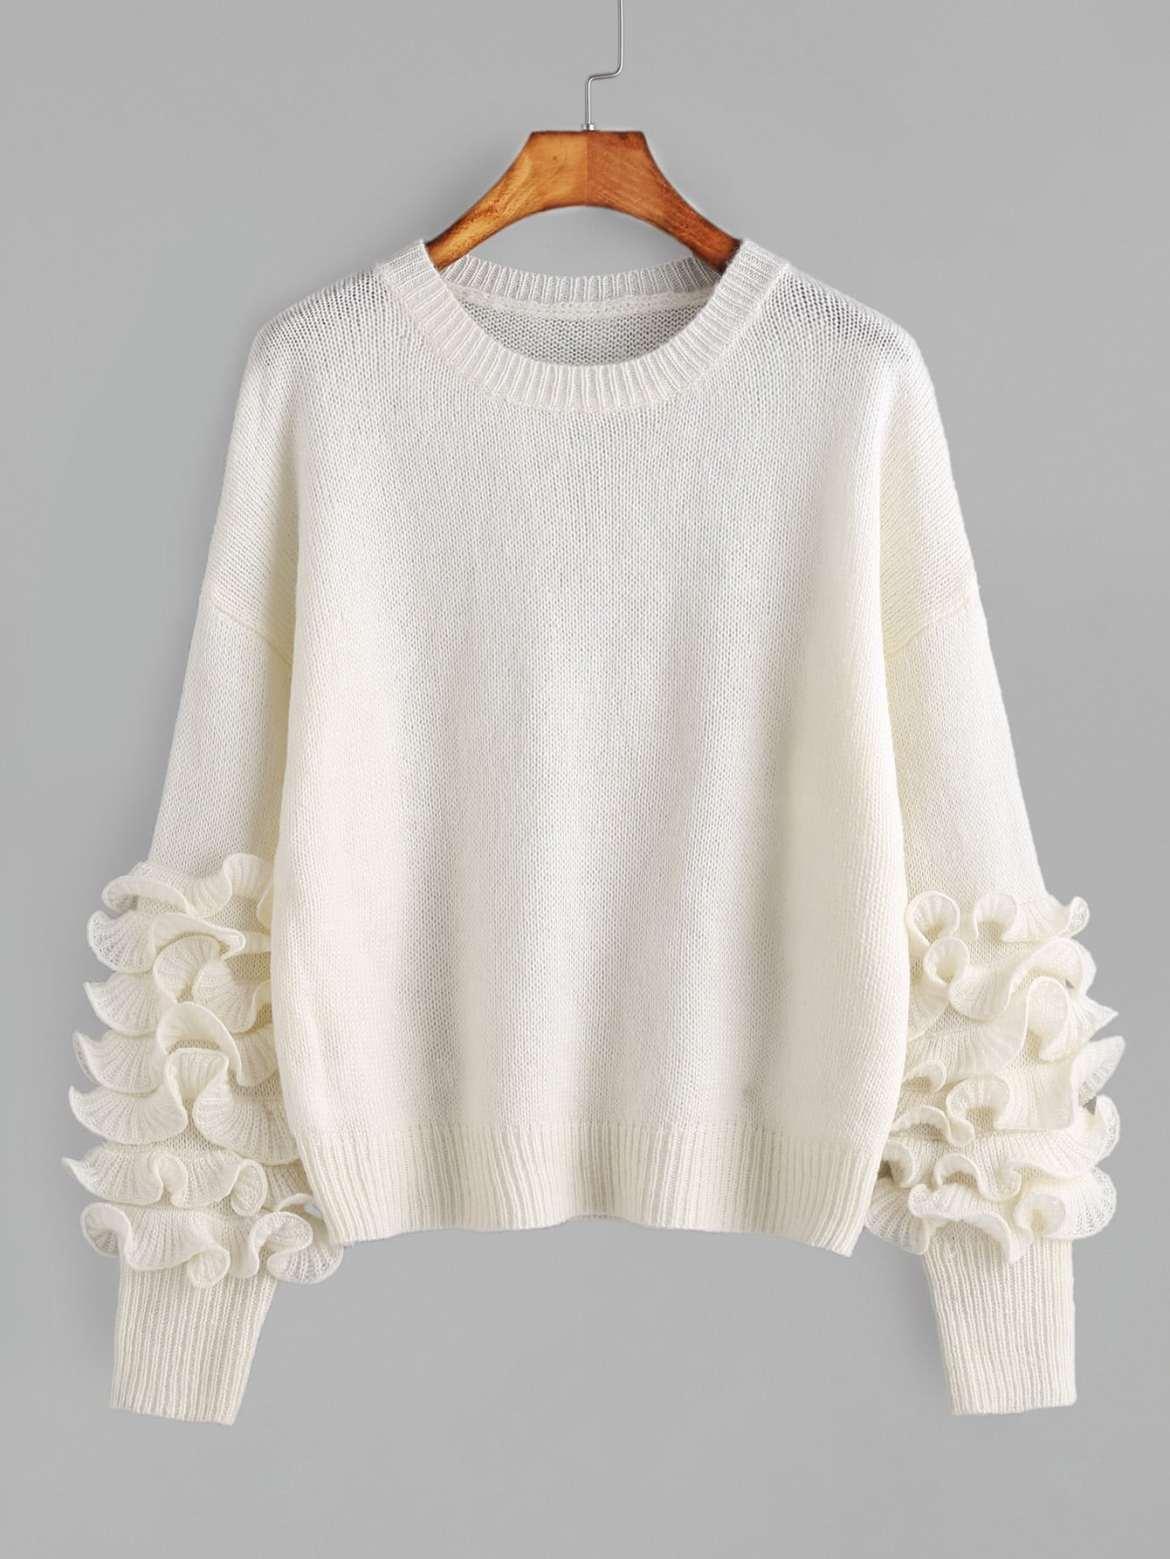 blogger blog tendencias primavera verano trendy fashion shein influencer madrid españa blog de moda